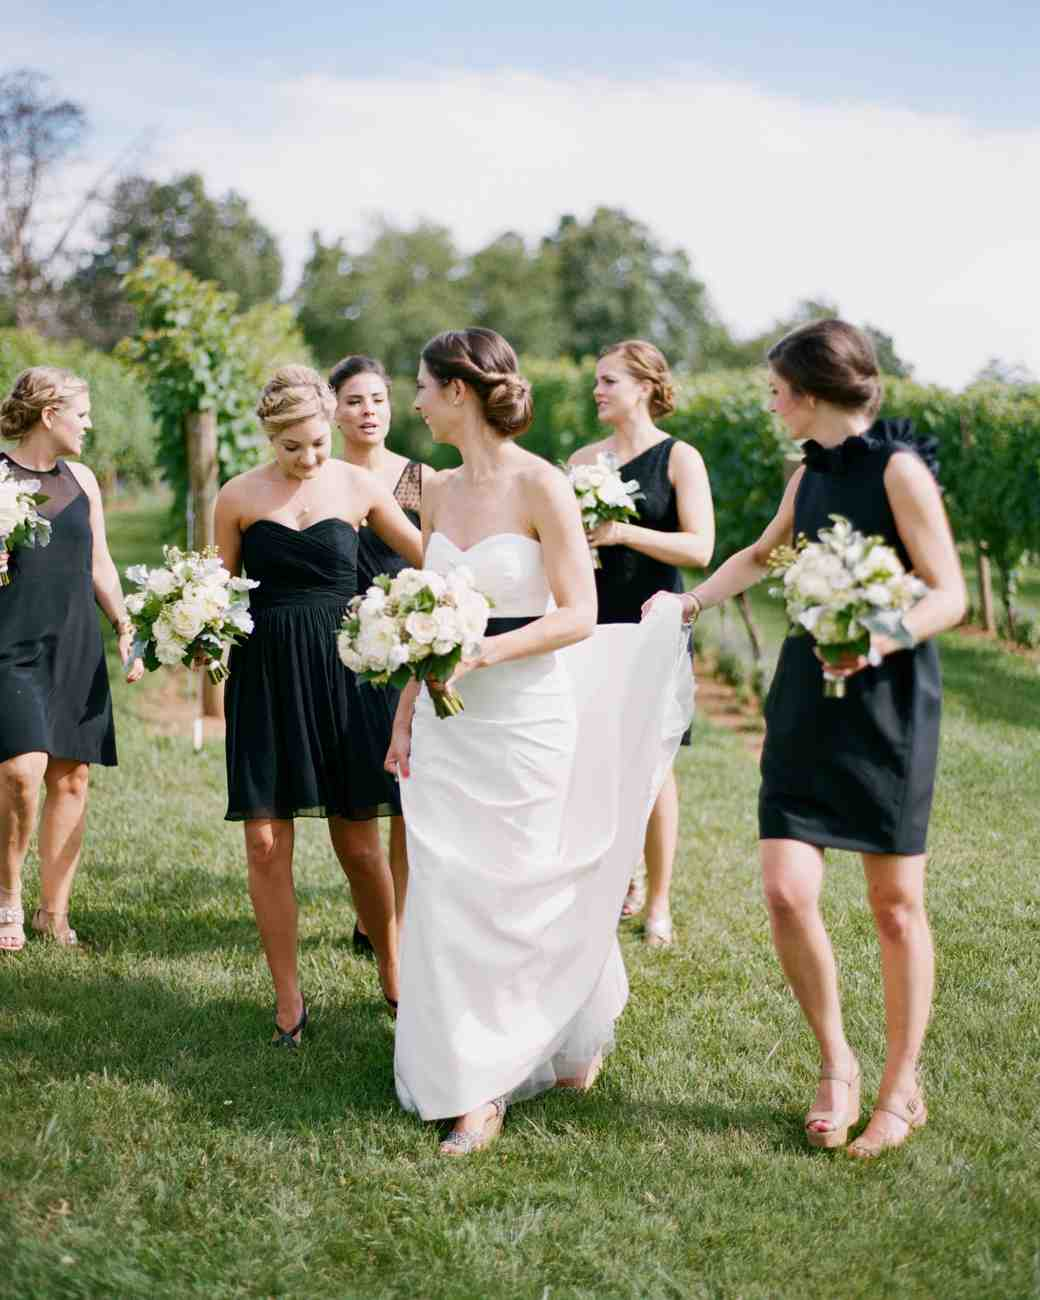 bridal-party-candids-6-0416.jpg